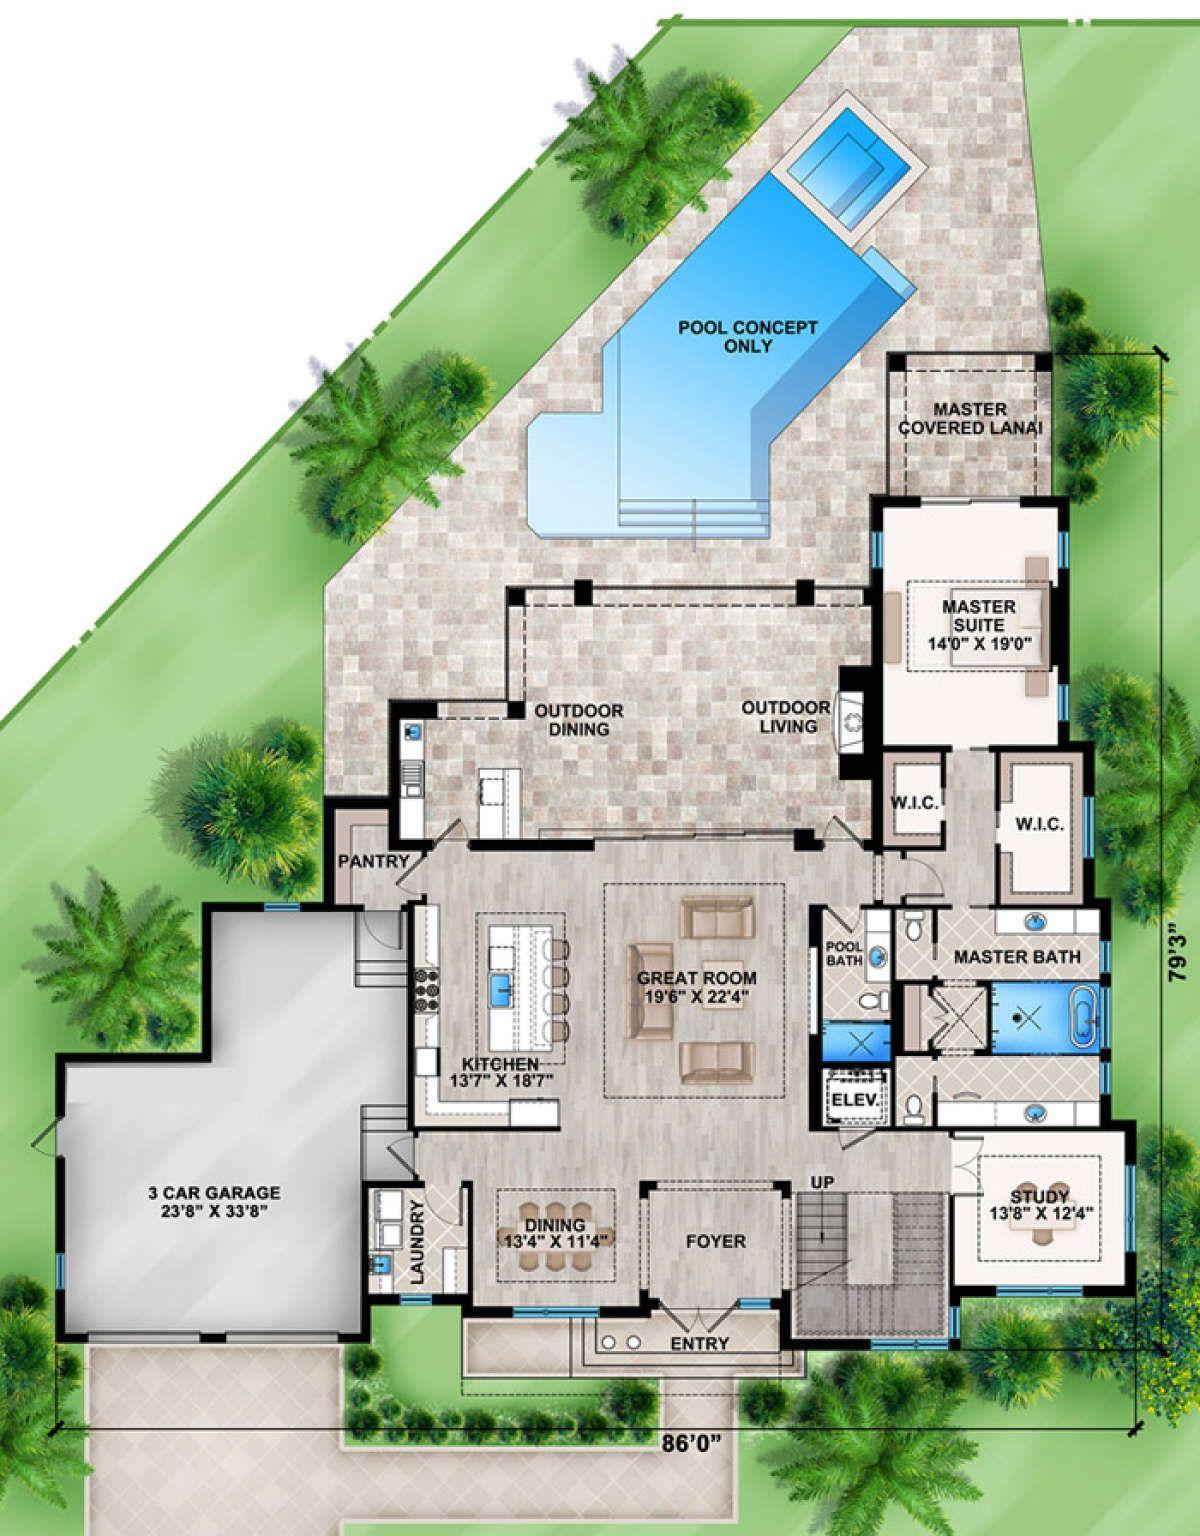 House Plan 207 00022 Contemporary Plan 4 368 Square Feet 4 Bedrooms 5 Bathrooms In 2020 Contemporary House Plans Modern Contemporary House Plans Modern Style House Plans